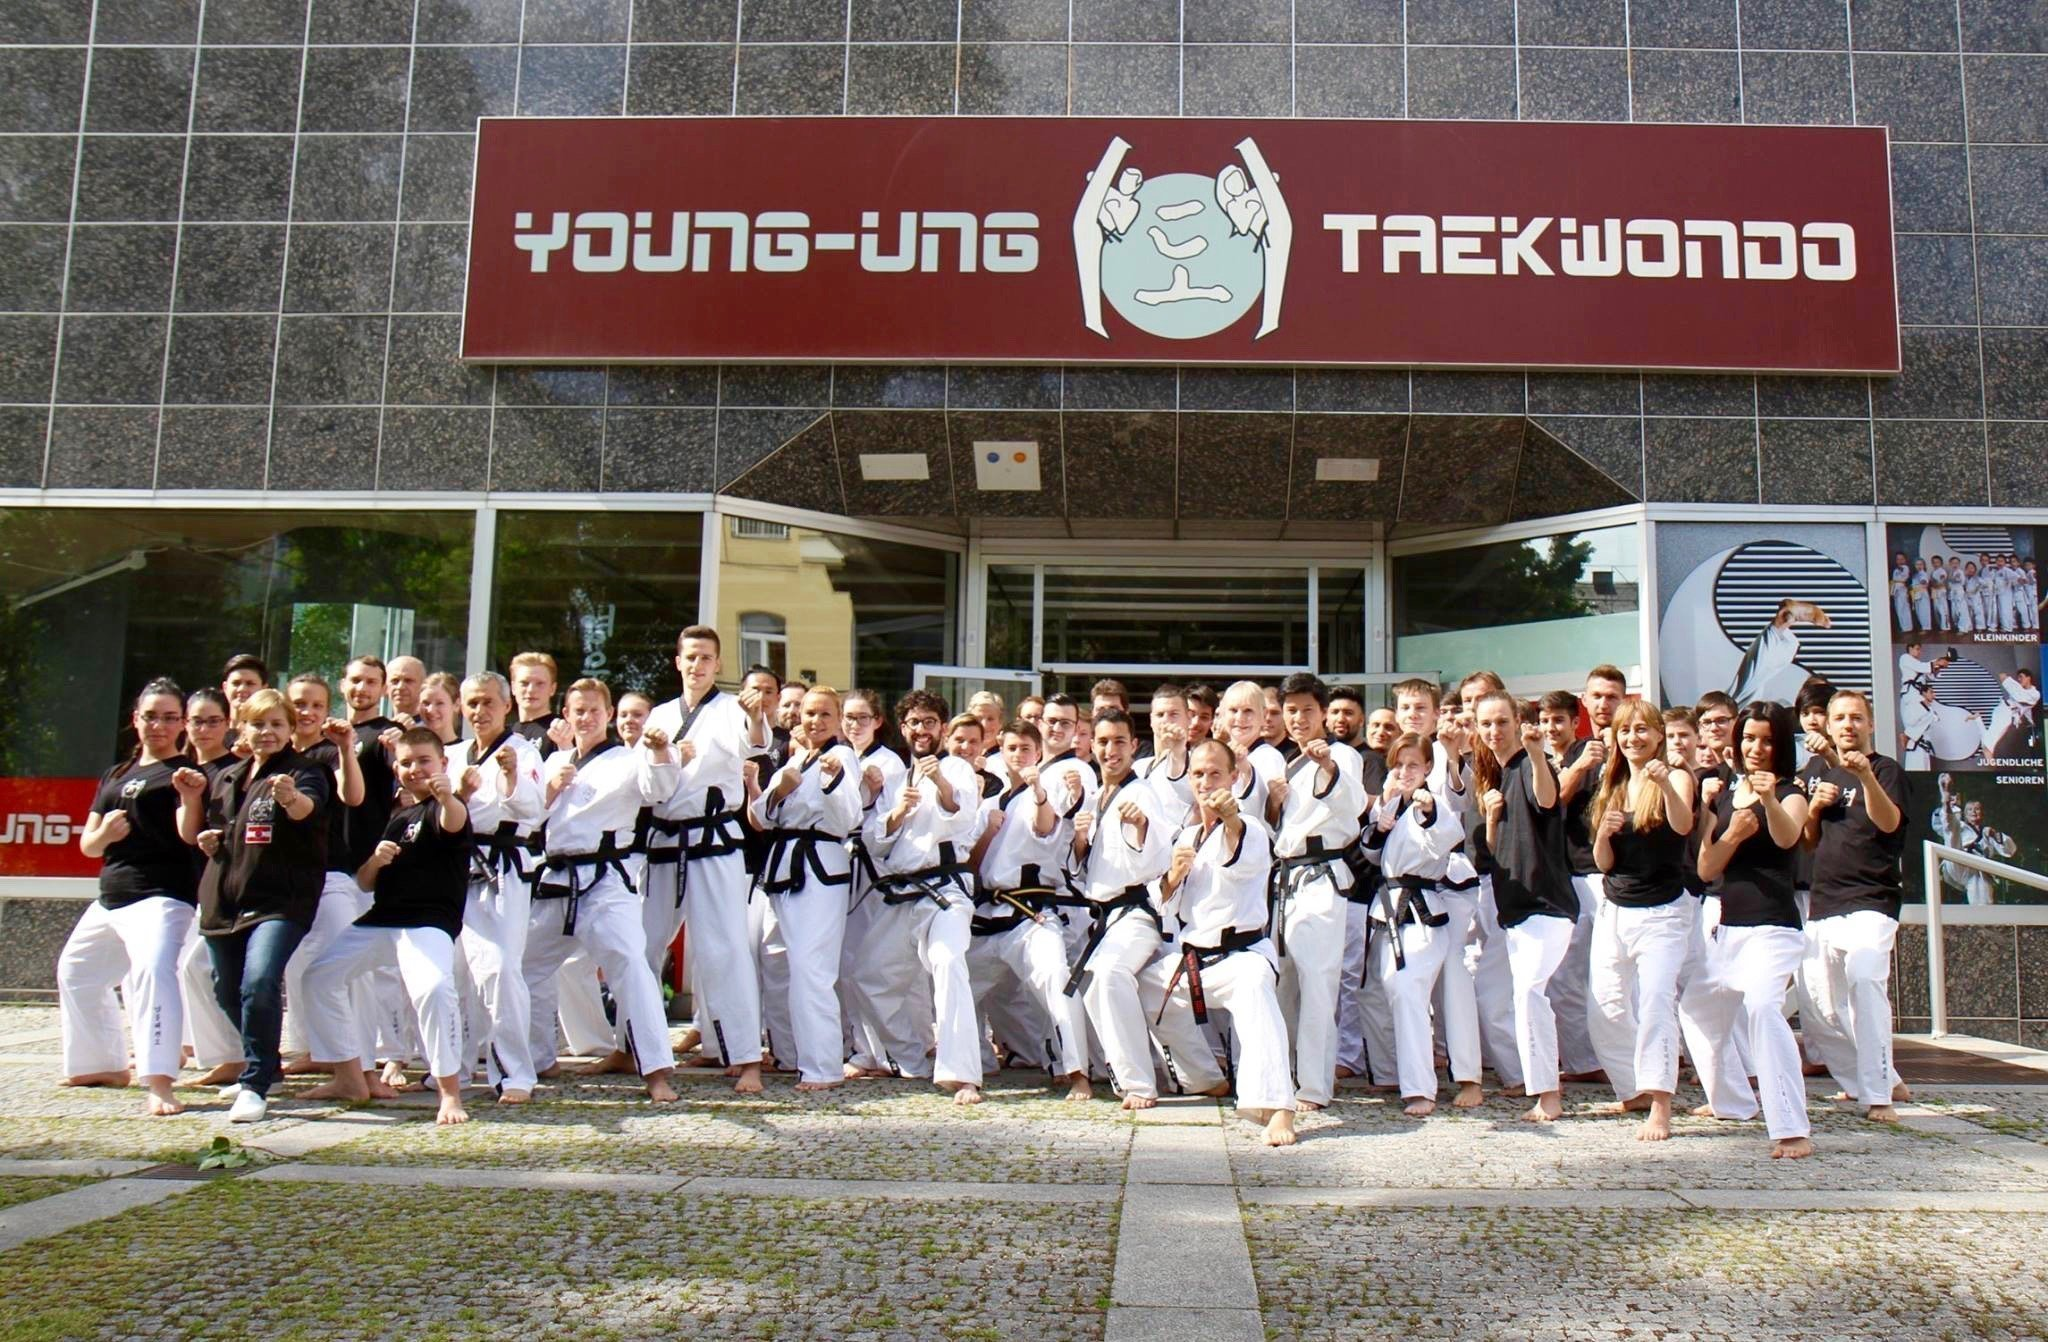 YOUNG-UNG Taekwondo Trainerakademie Kampfsport Ausbildung Trainer